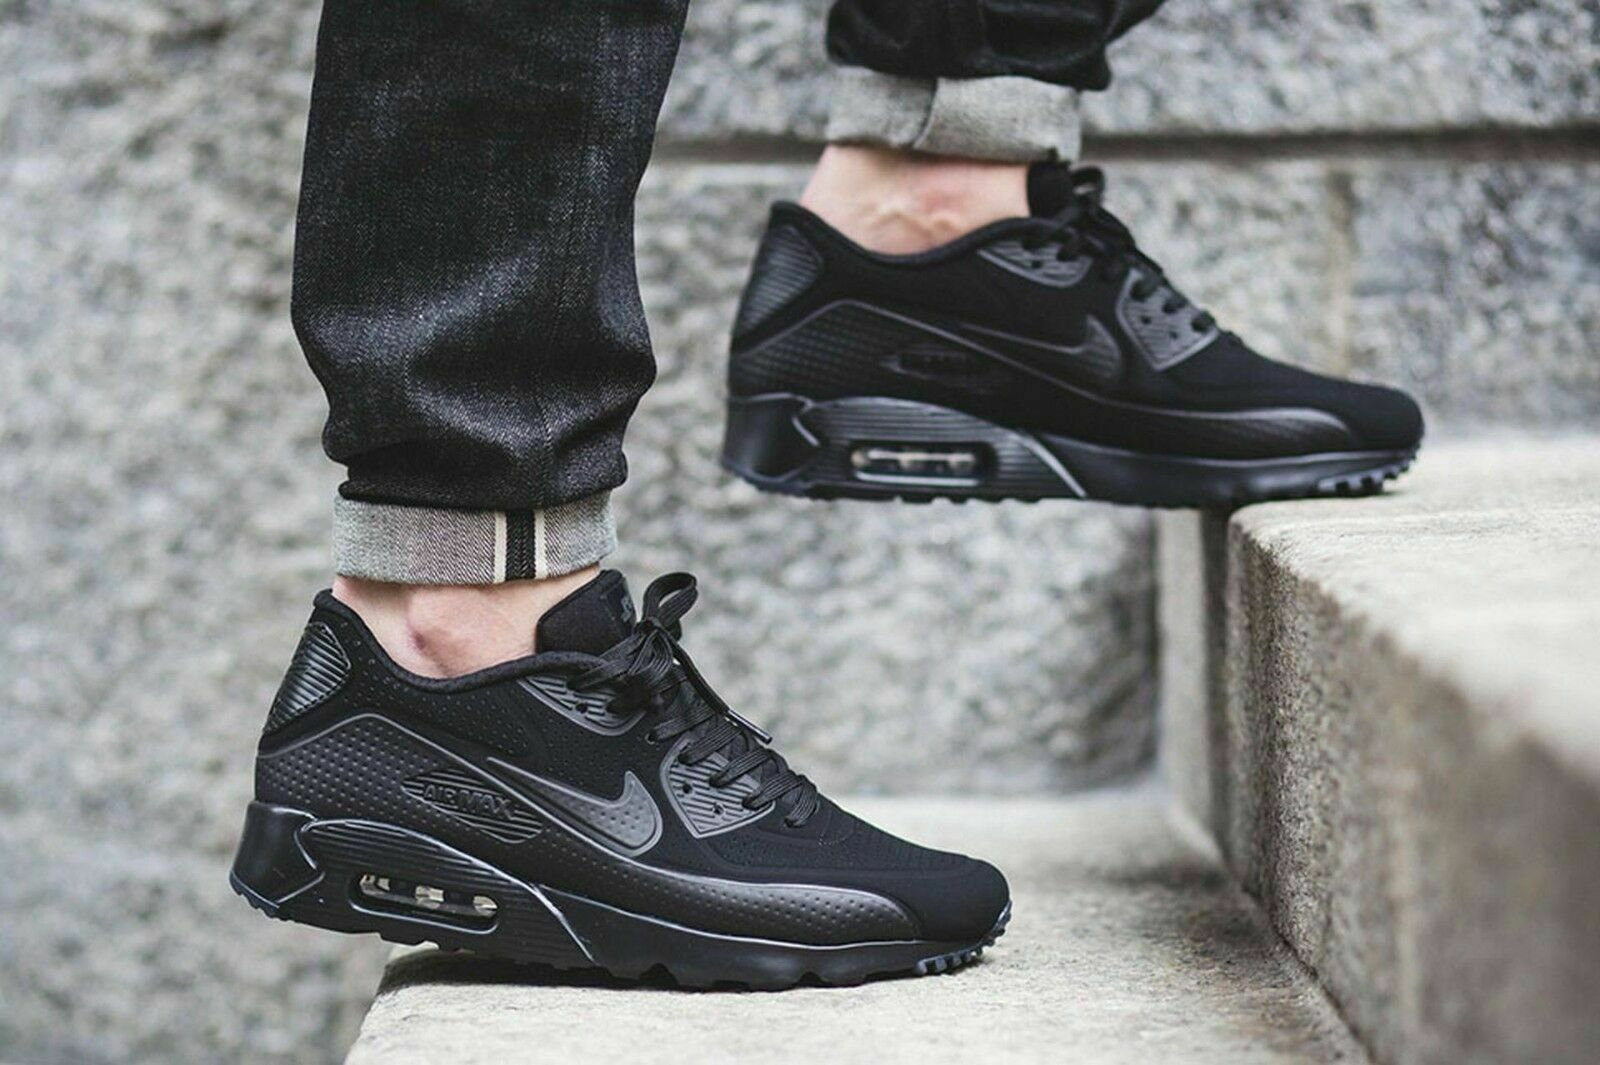 Nike Air Max 90 Ultra Moire Men's Black Black 819477-010 Sz 13